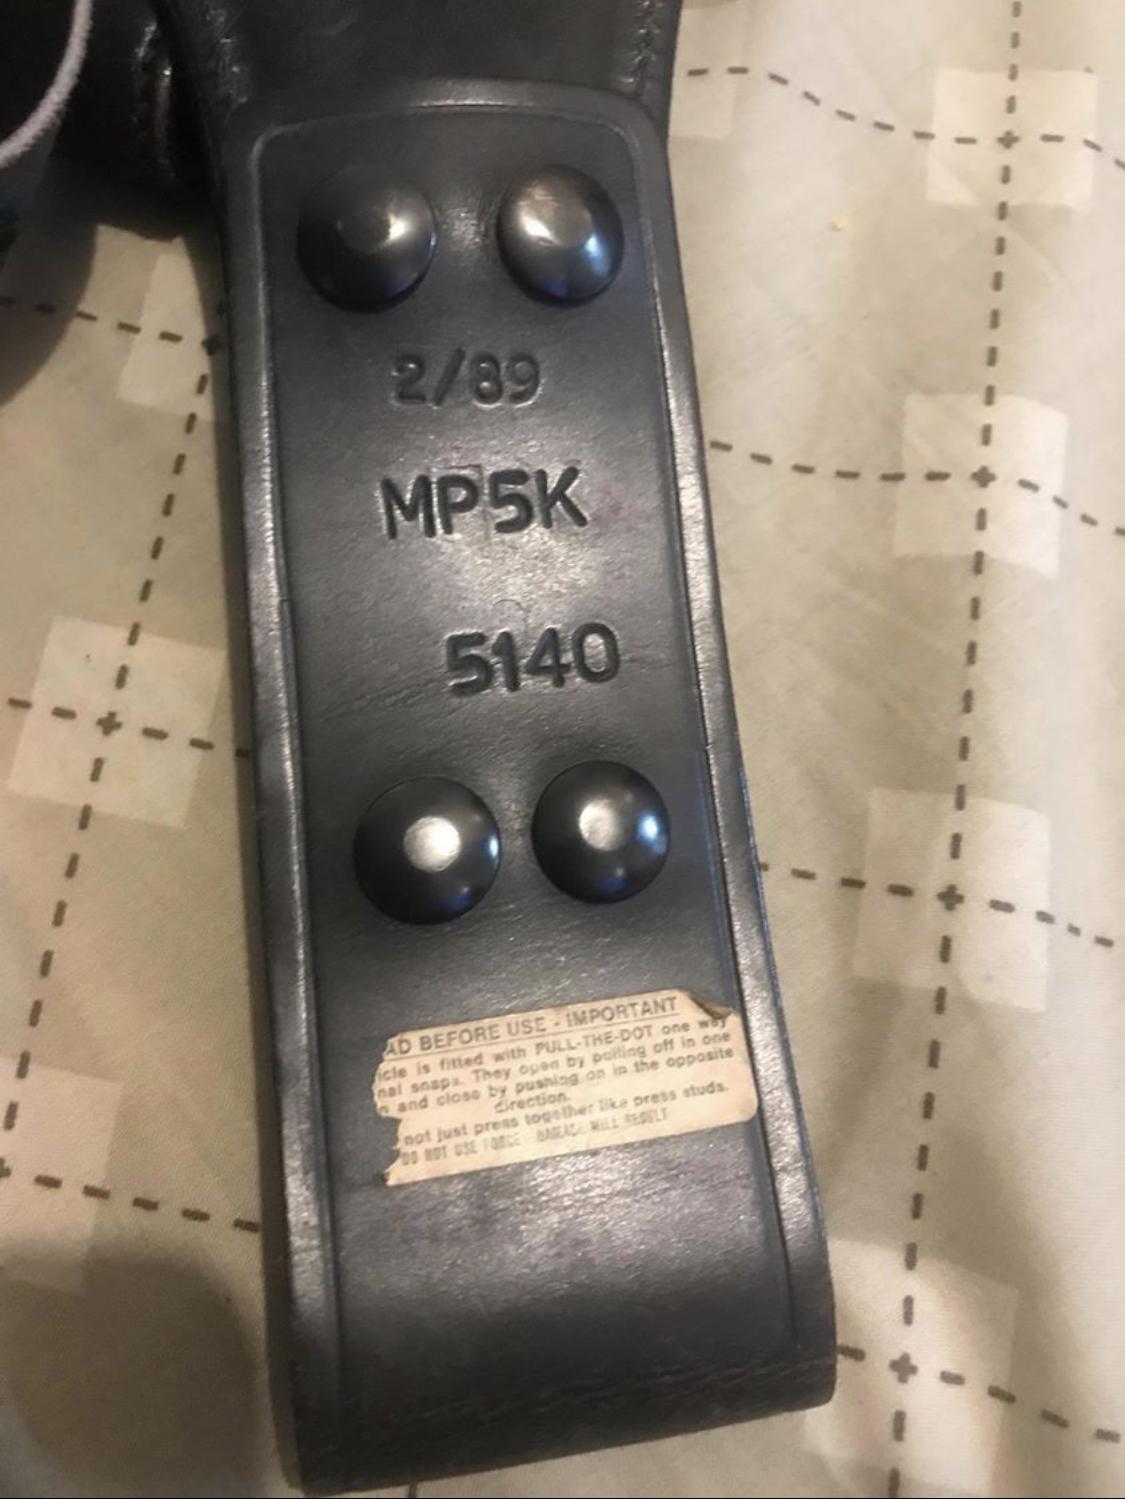 Genuine Paul Evers MP5K Shoulder Holster-f9fcb649-b715-42ff-9018-88d8b97949ff_1547813494317.jpeg